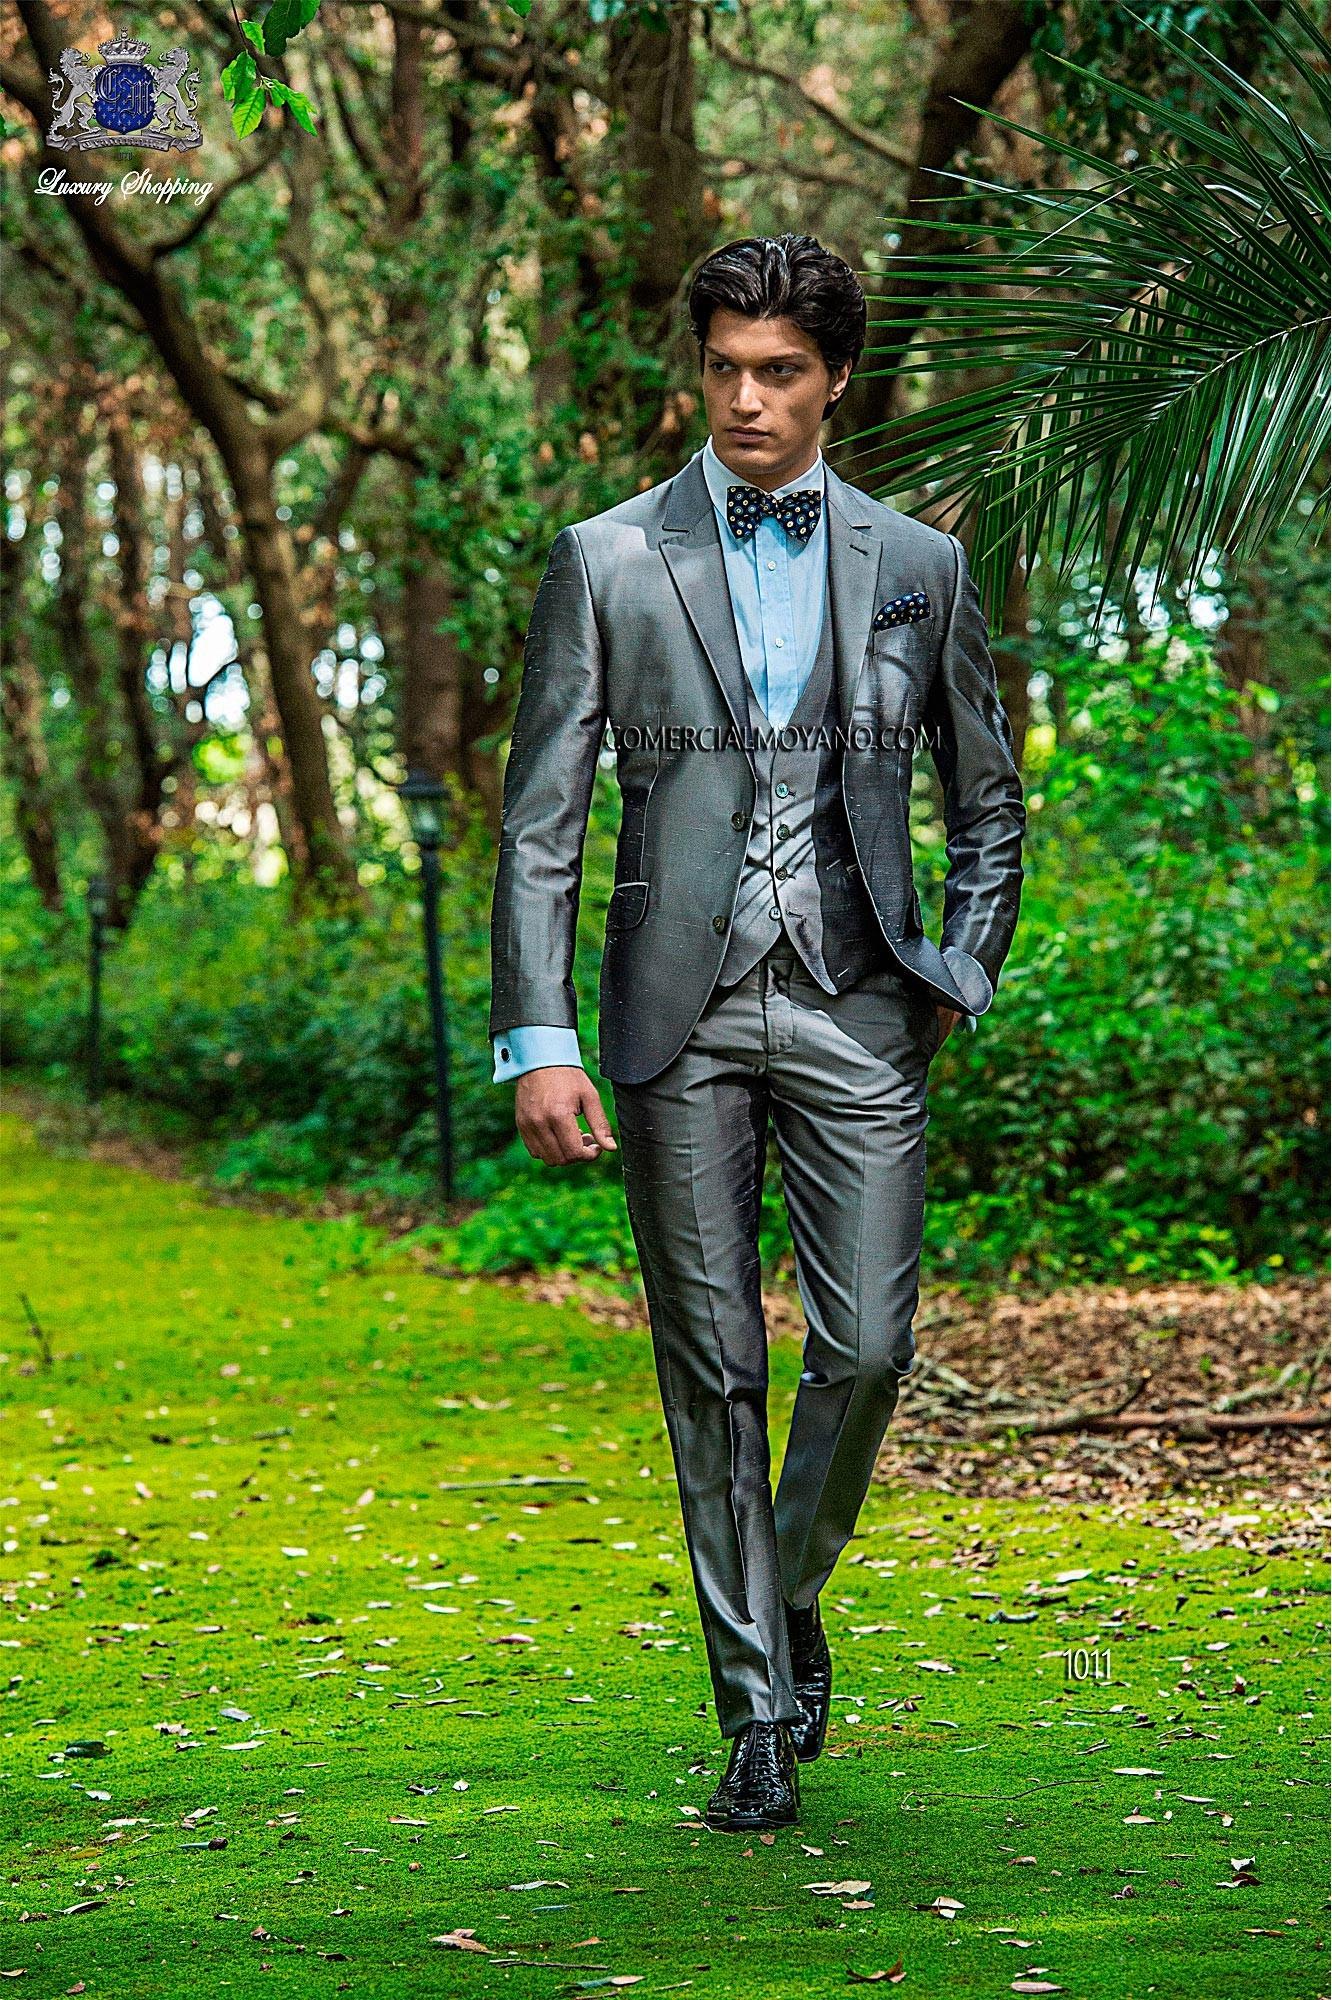 Traje de moda italiano gris plata shantung 3 piezas 1011 Ottavio Nuccio Gala. Loading zoom